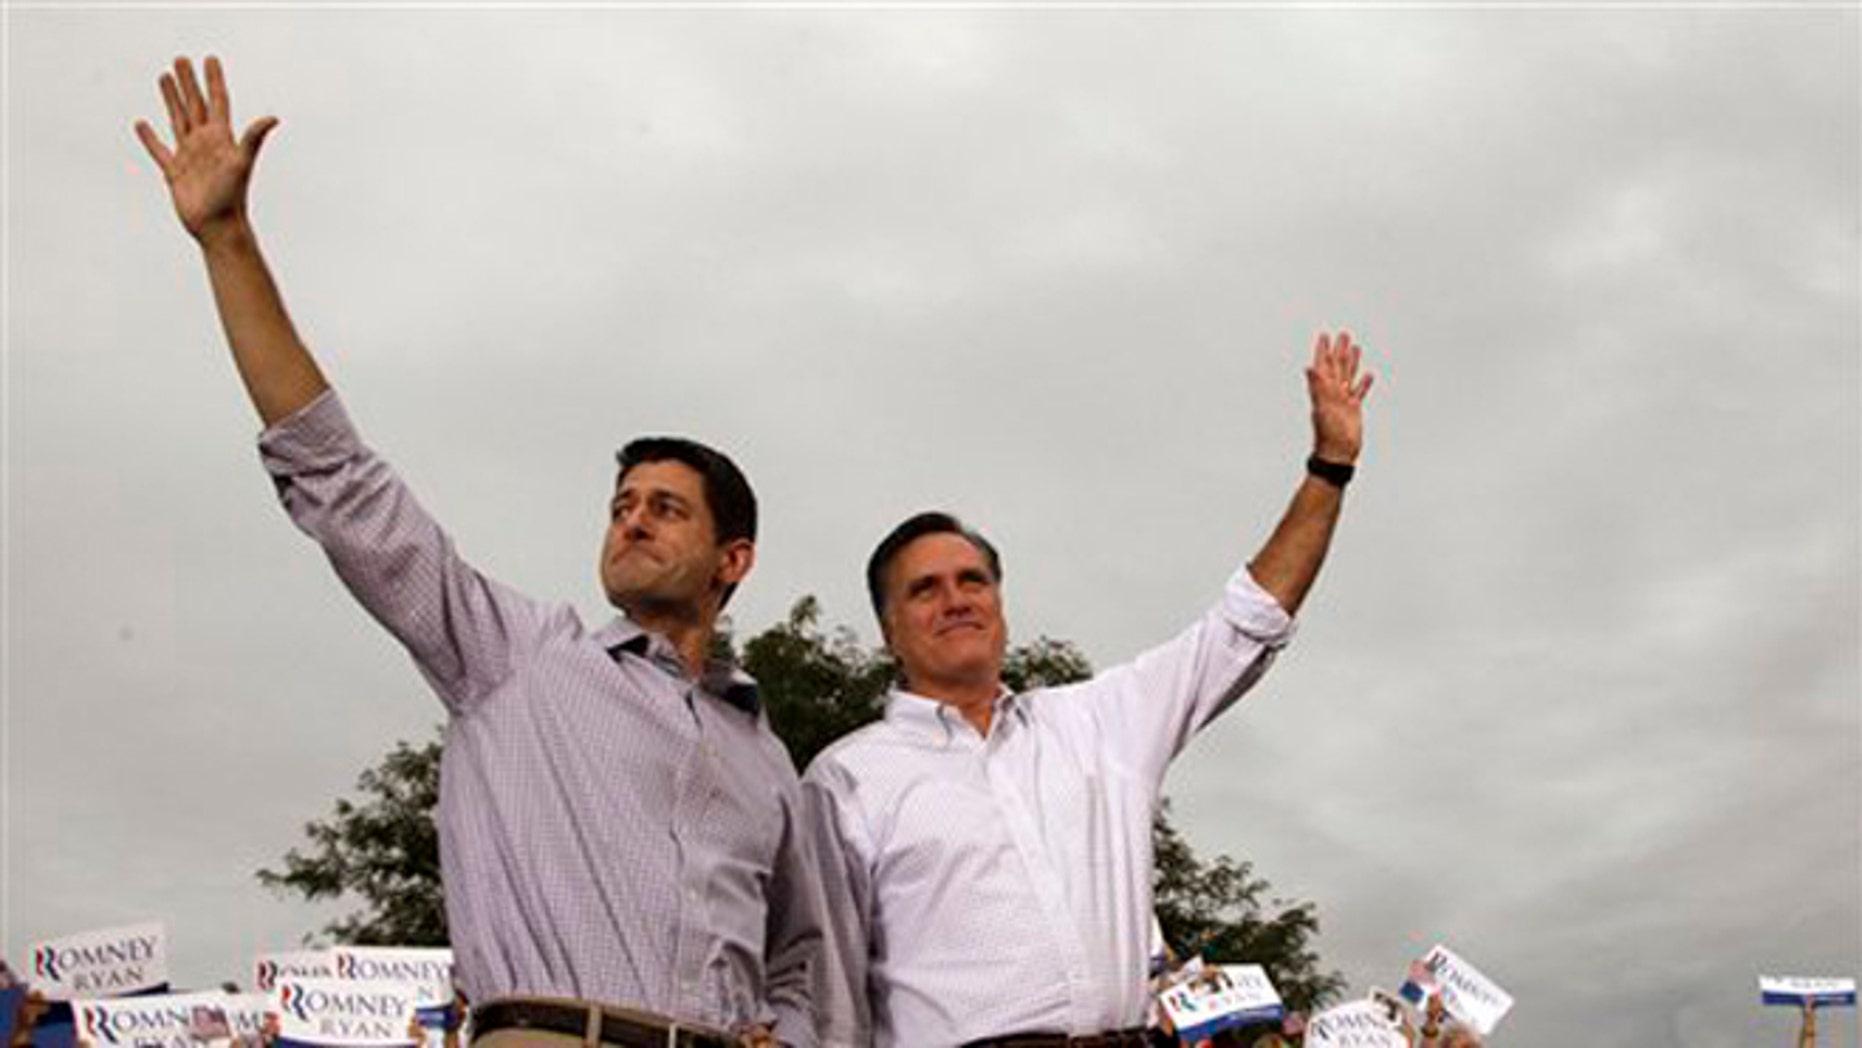 Aug. 12, 2012: Mitt Romney, right, and vice presidential running mate Rep. Paul Ryan of  Wisconsin, at the Waukesha County Expo Center ,in Waukesha, Wis.